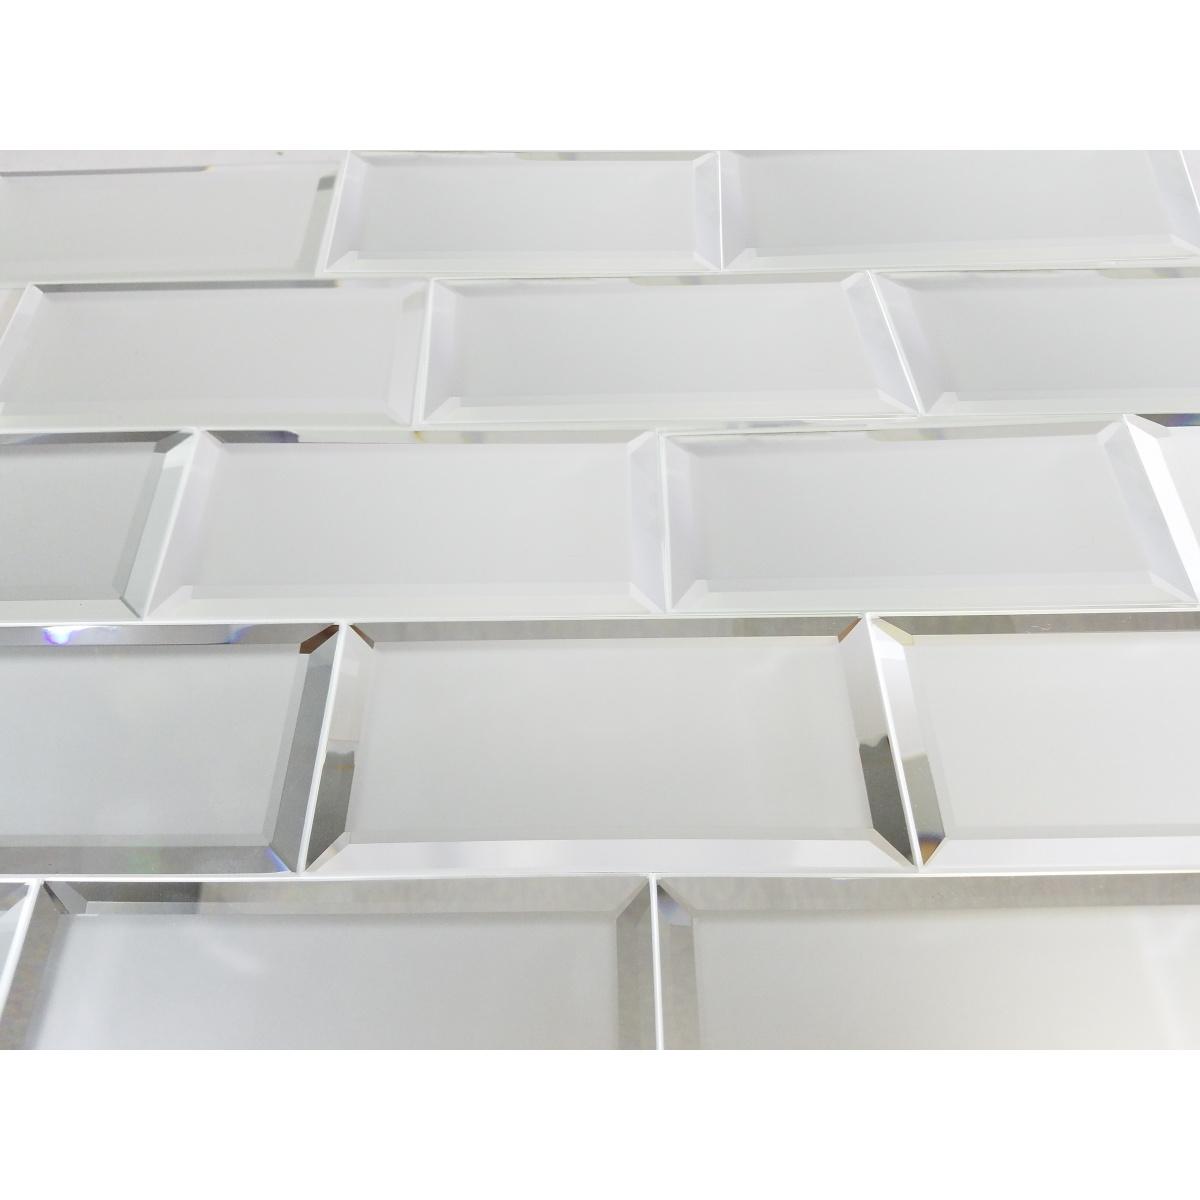 3x6 Reflections Silver Matte 3 X 6 Subway Tile Shop By Shape